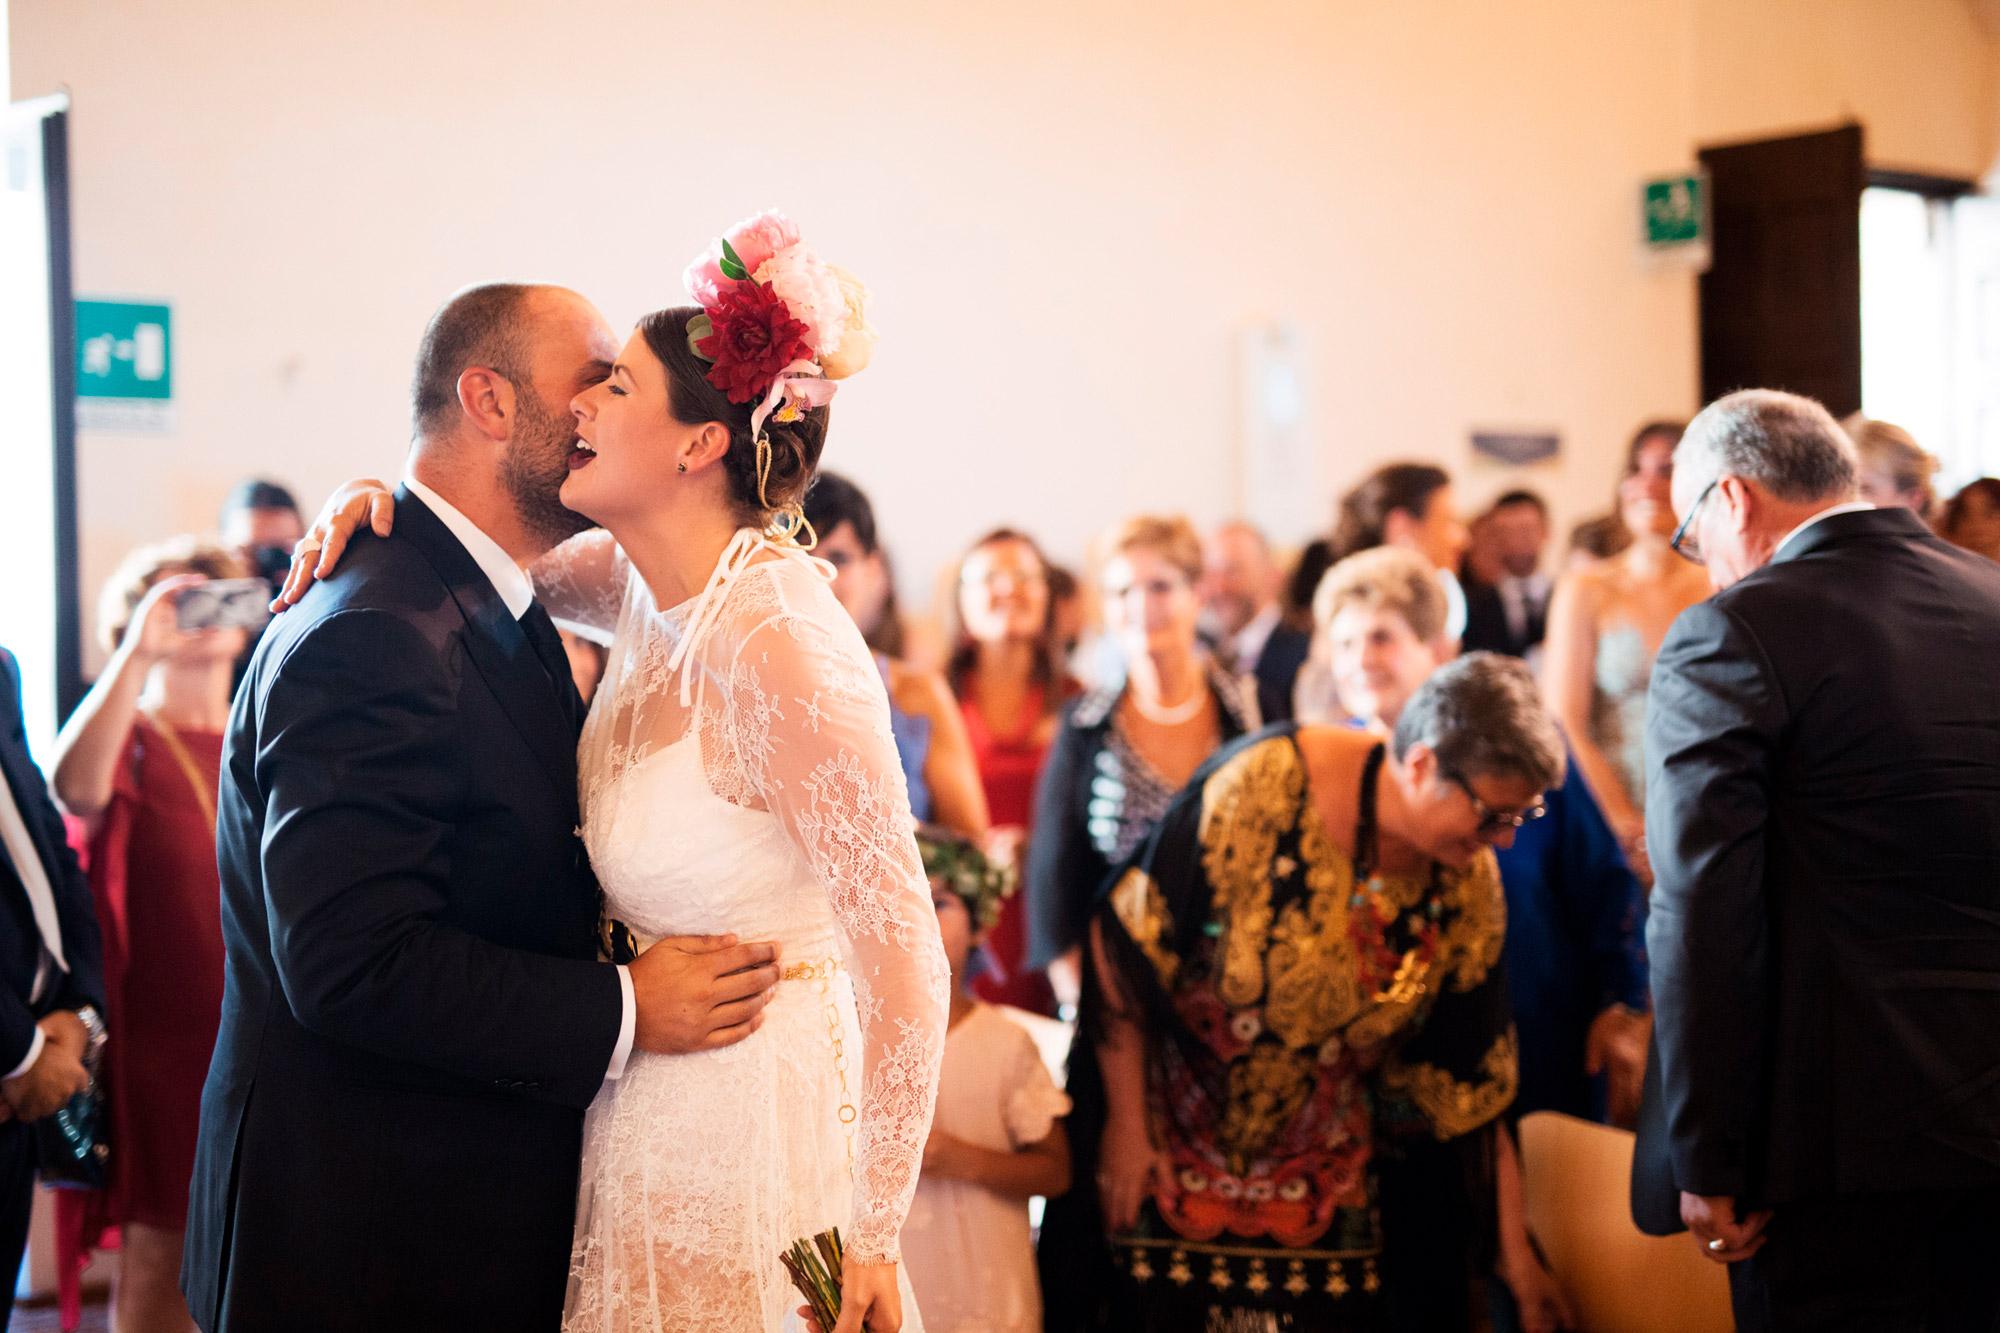 180-FIKUS-PUGLIA-wedding-ostuni-masseria.jpg